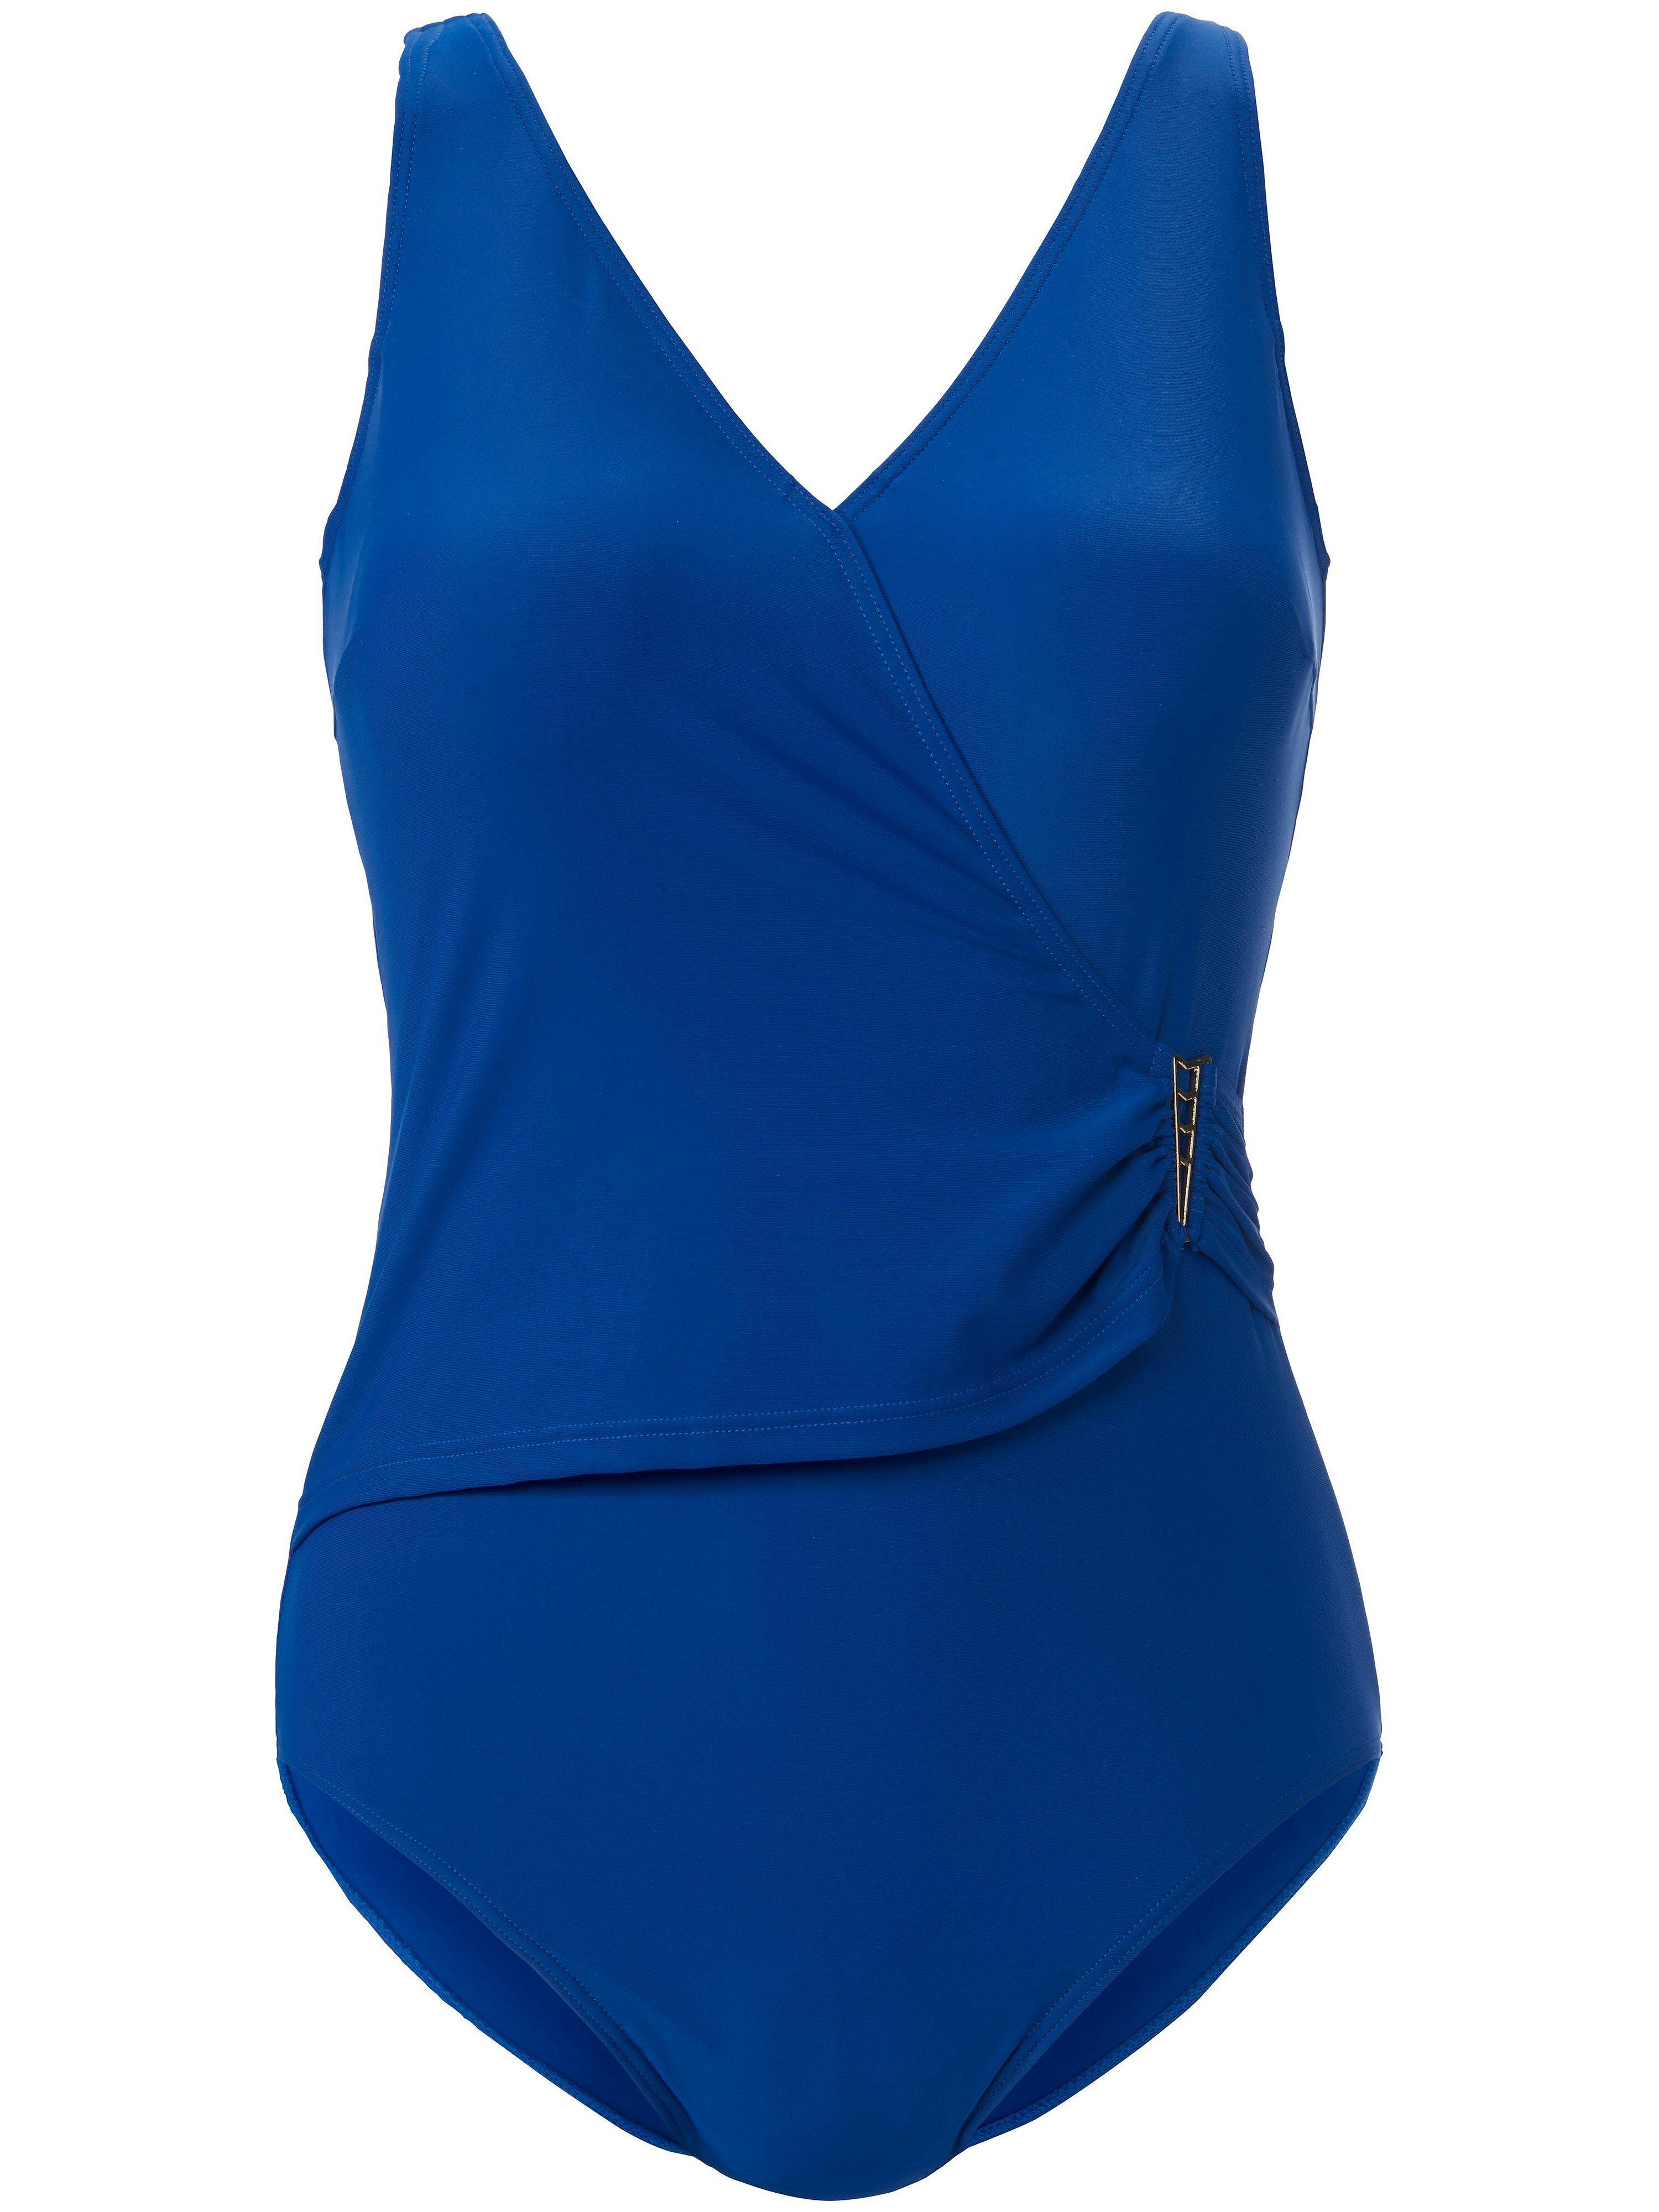 Naturana Le maillot bain semi-bustier style croisé  Naturana bleu  - Femme - 44